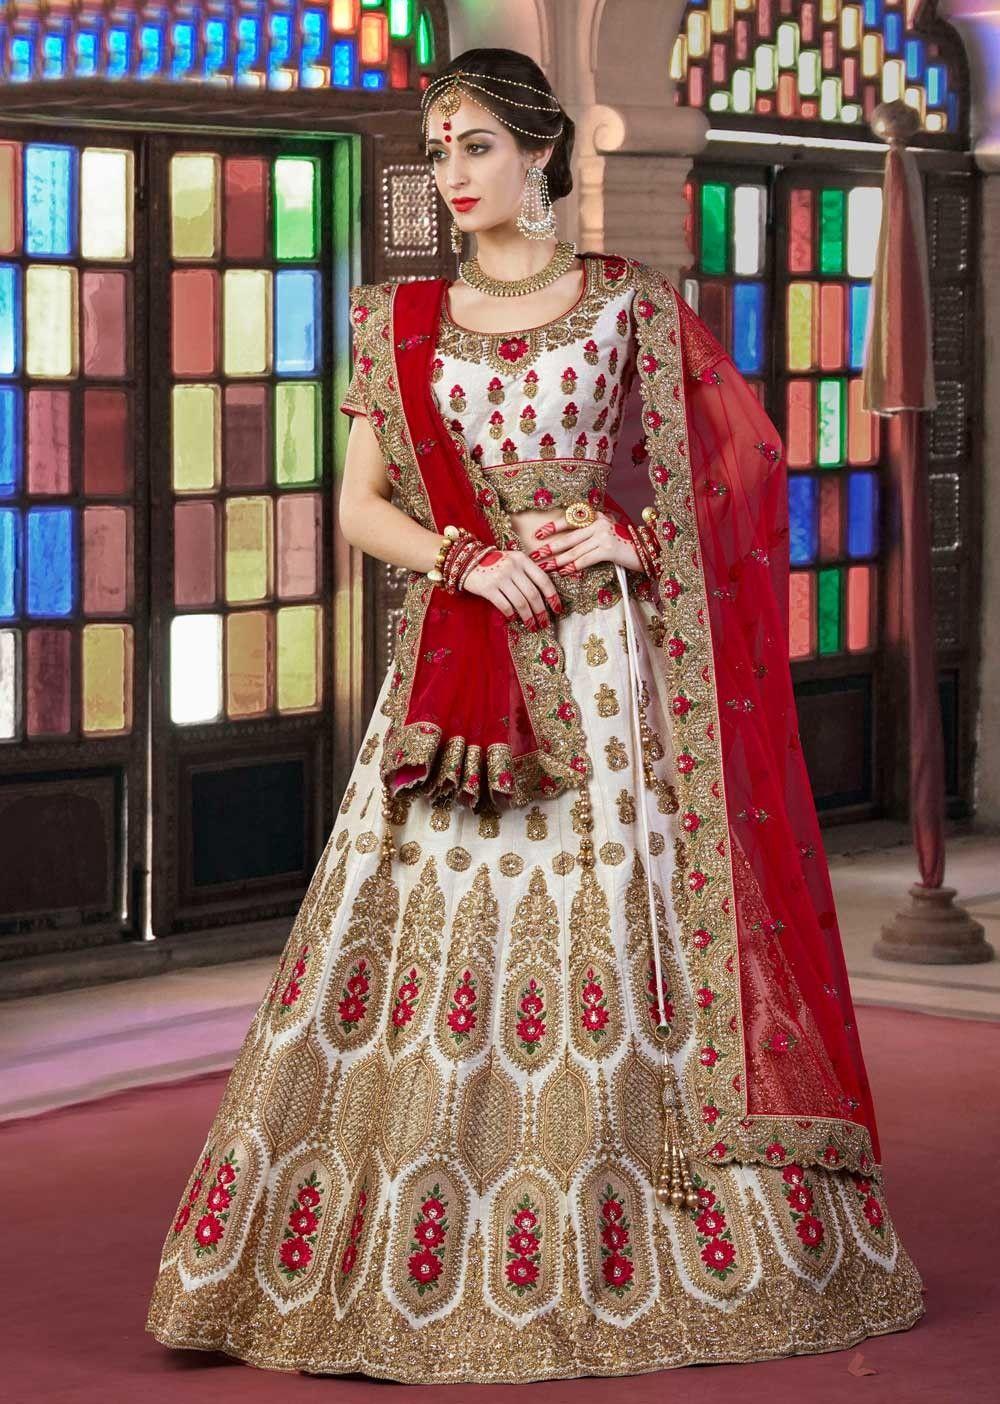 638e0f18a6 Off White Lehenga Choli, Silk Lehenga Choli, $437.87. Buy latest Lengha  choli with custom stitching and worldwide shipping.